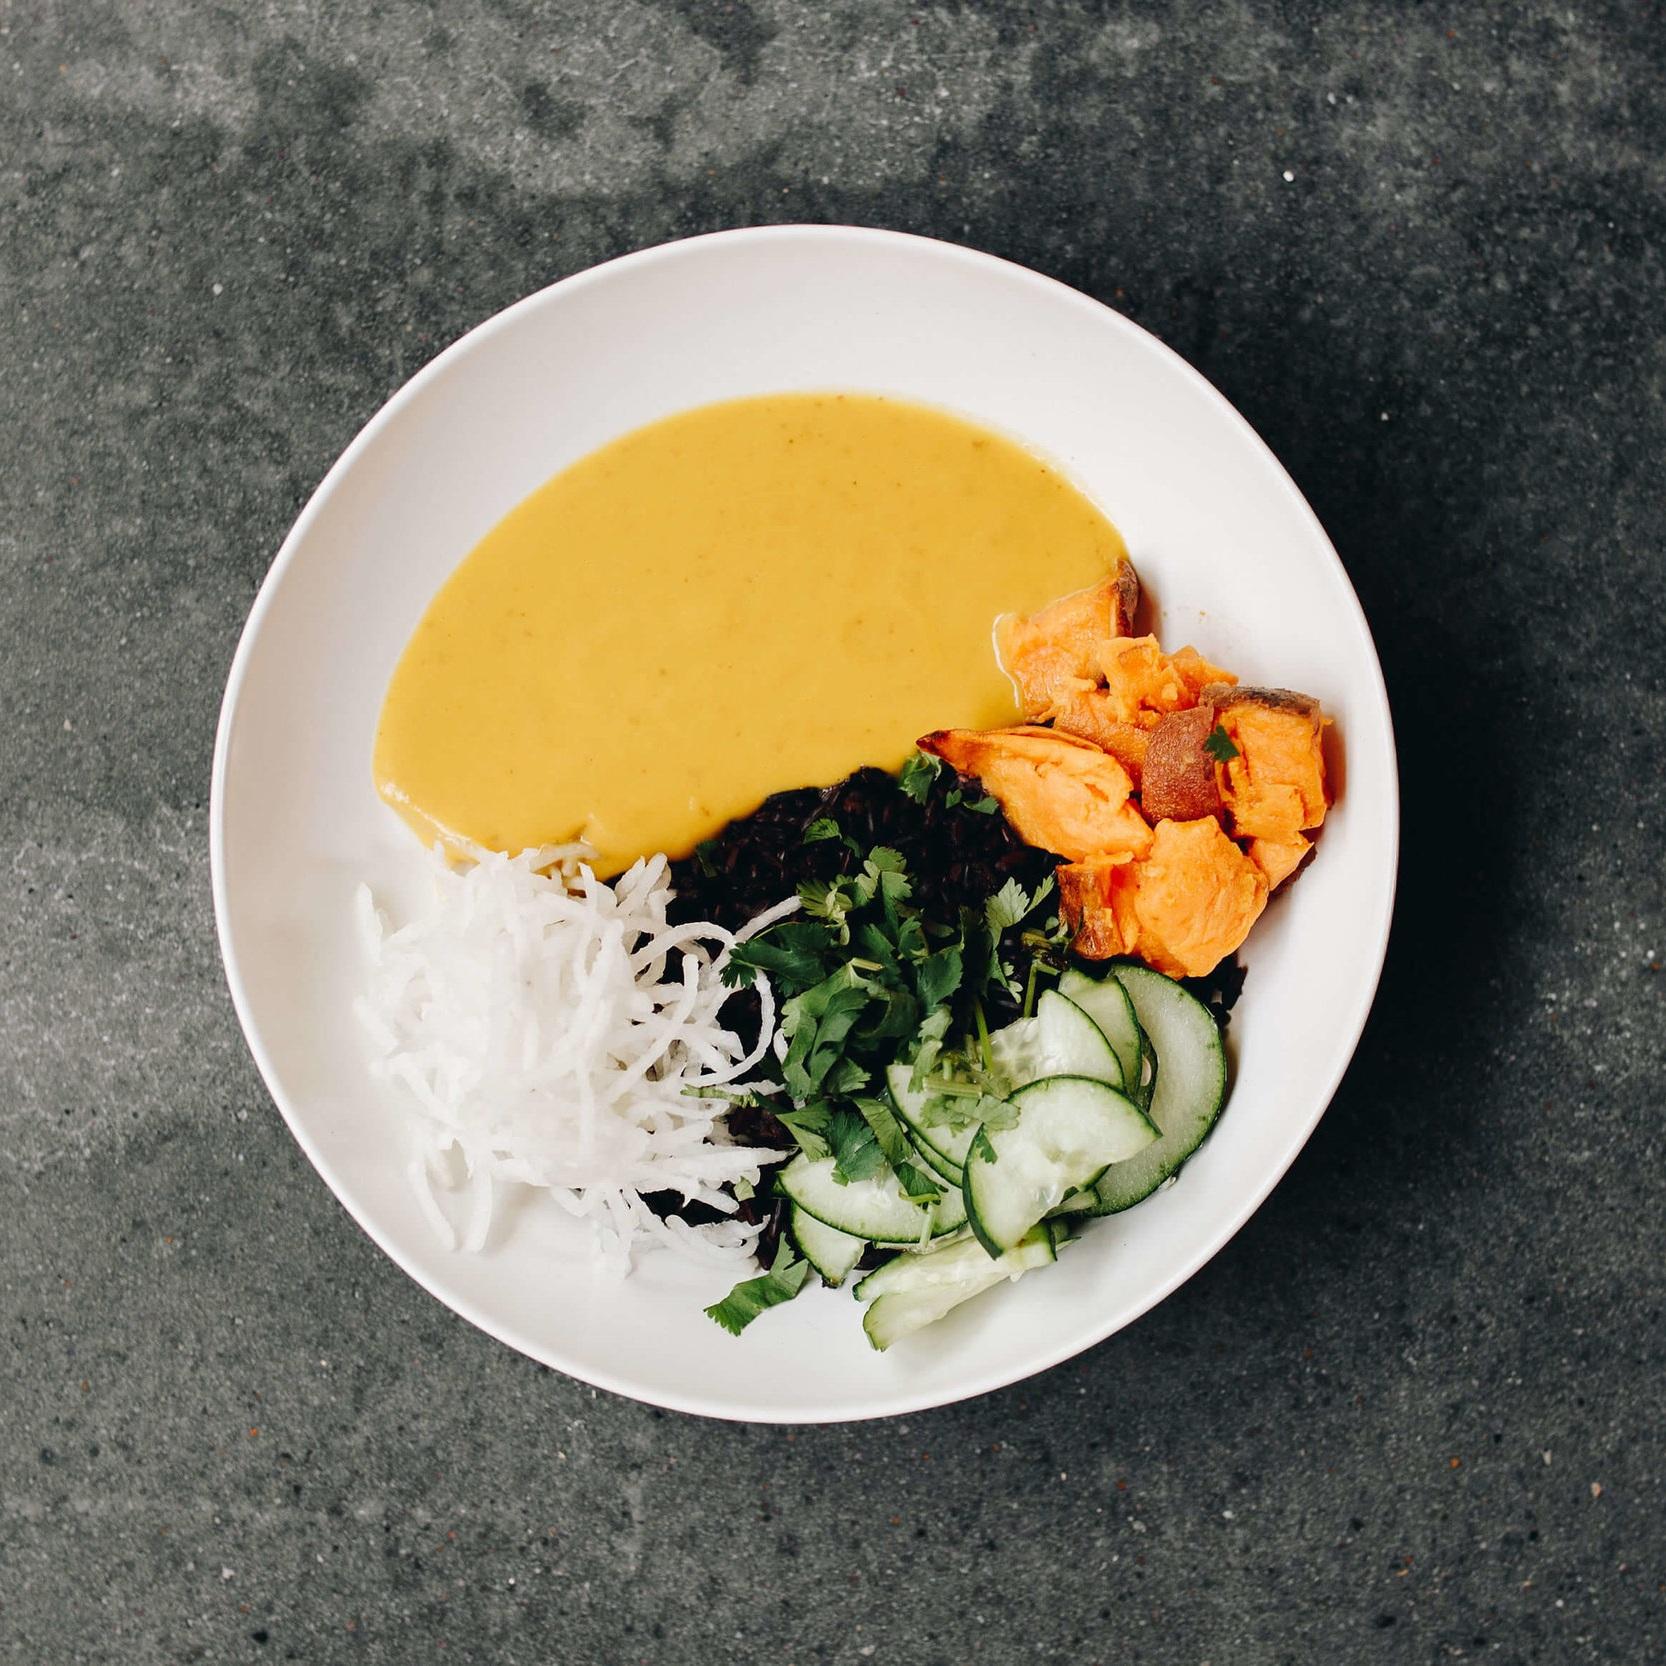 Thai Bowl - Thai sweet potato coconut sauce, forbidden black rice, roasted sweet potatoes, daikon, cucumber, cilantro, thai basil7.50